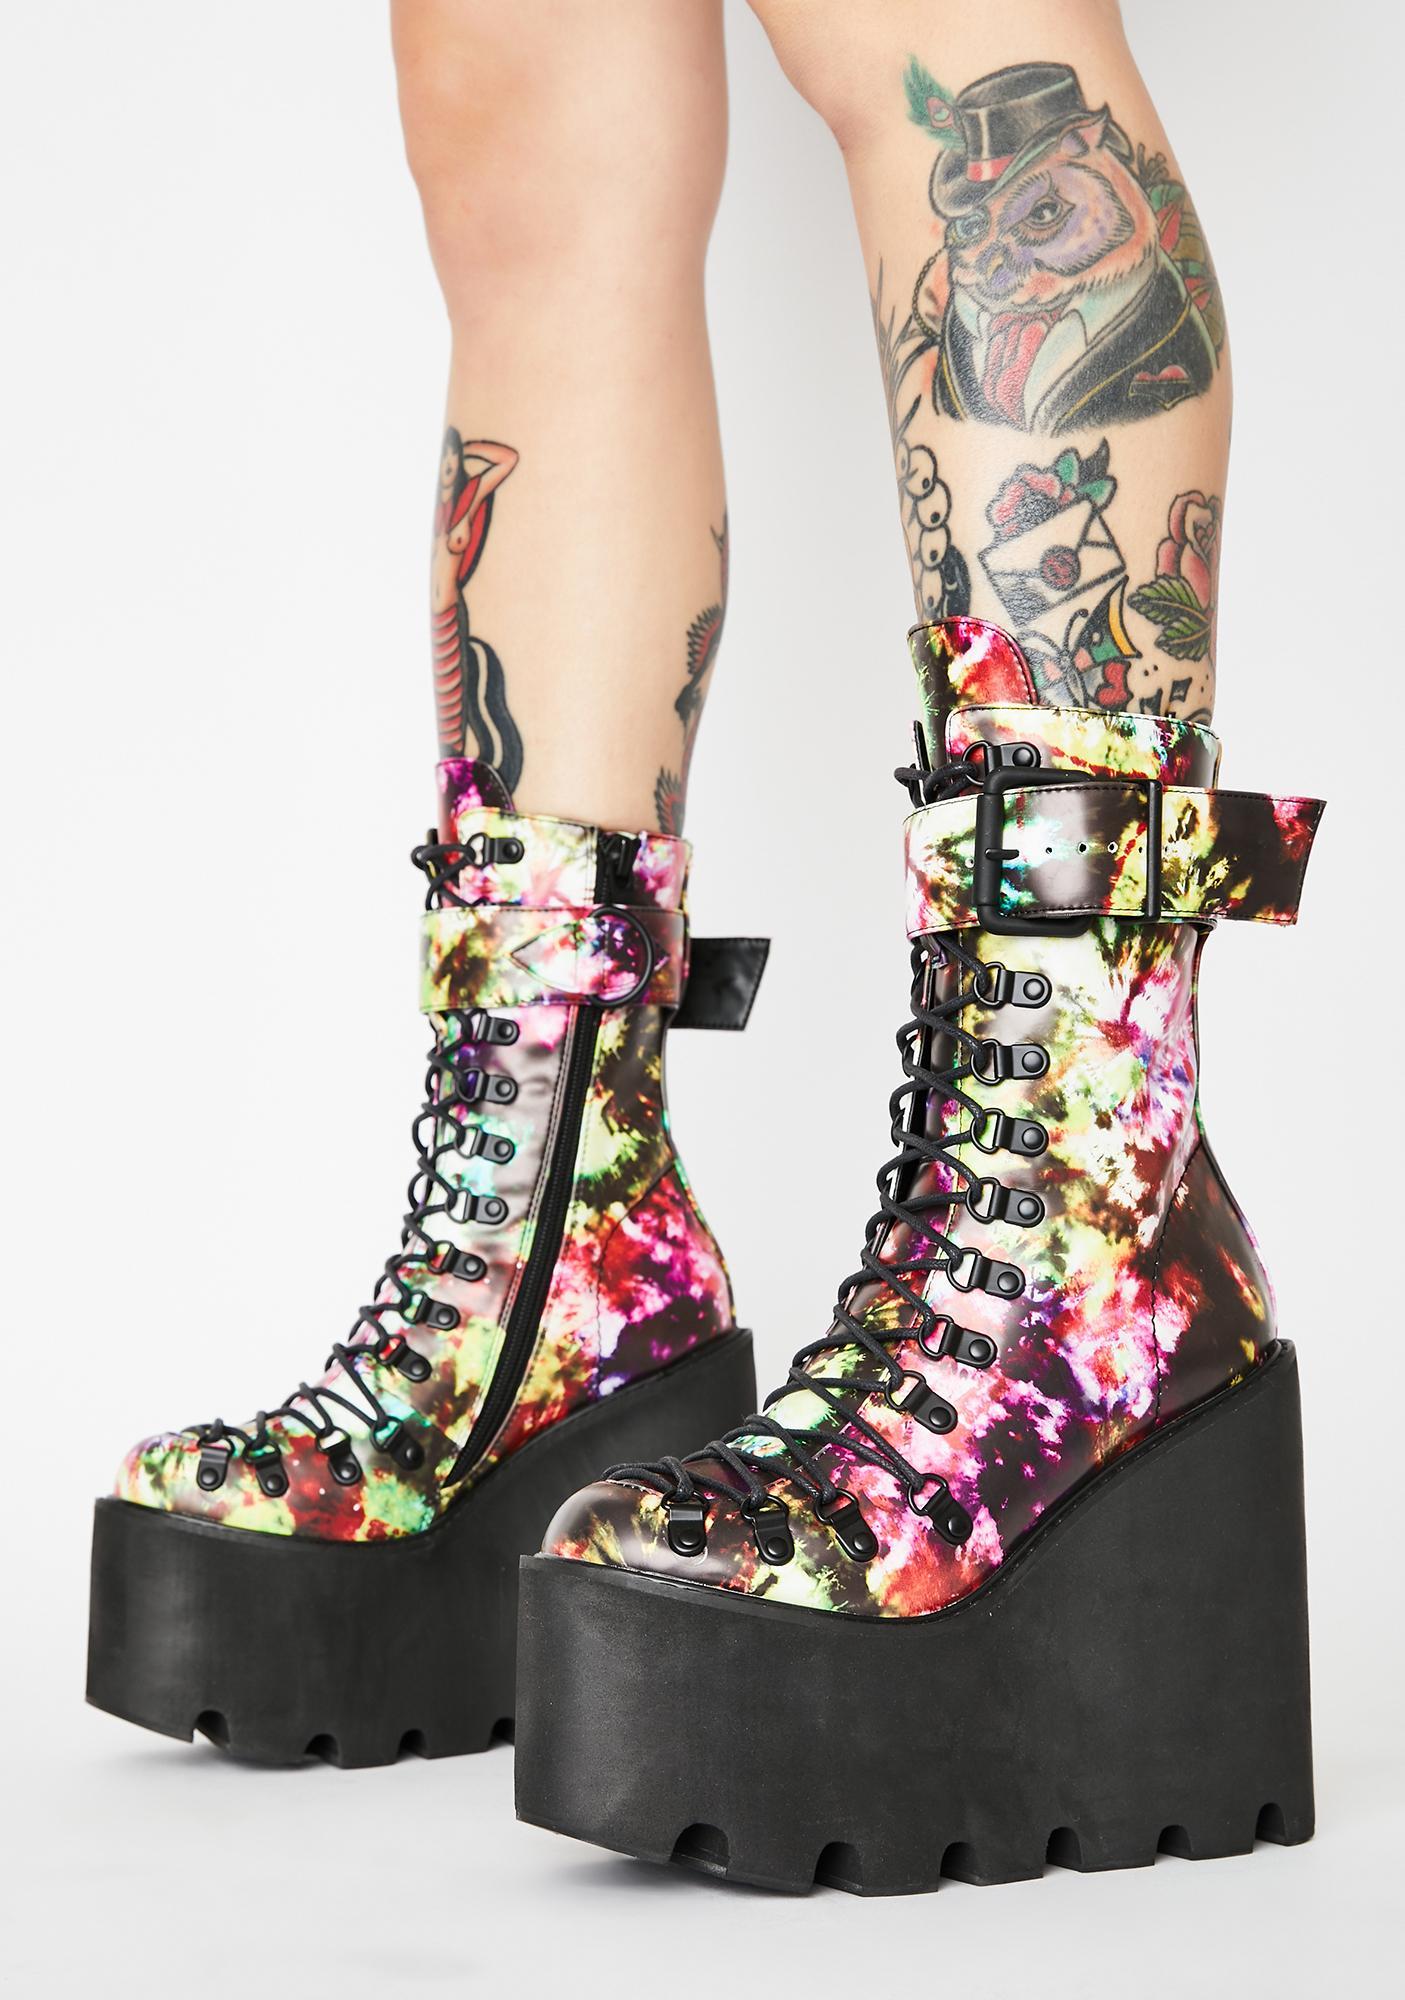 Club Exx Acid Sunrise Traitor Boots